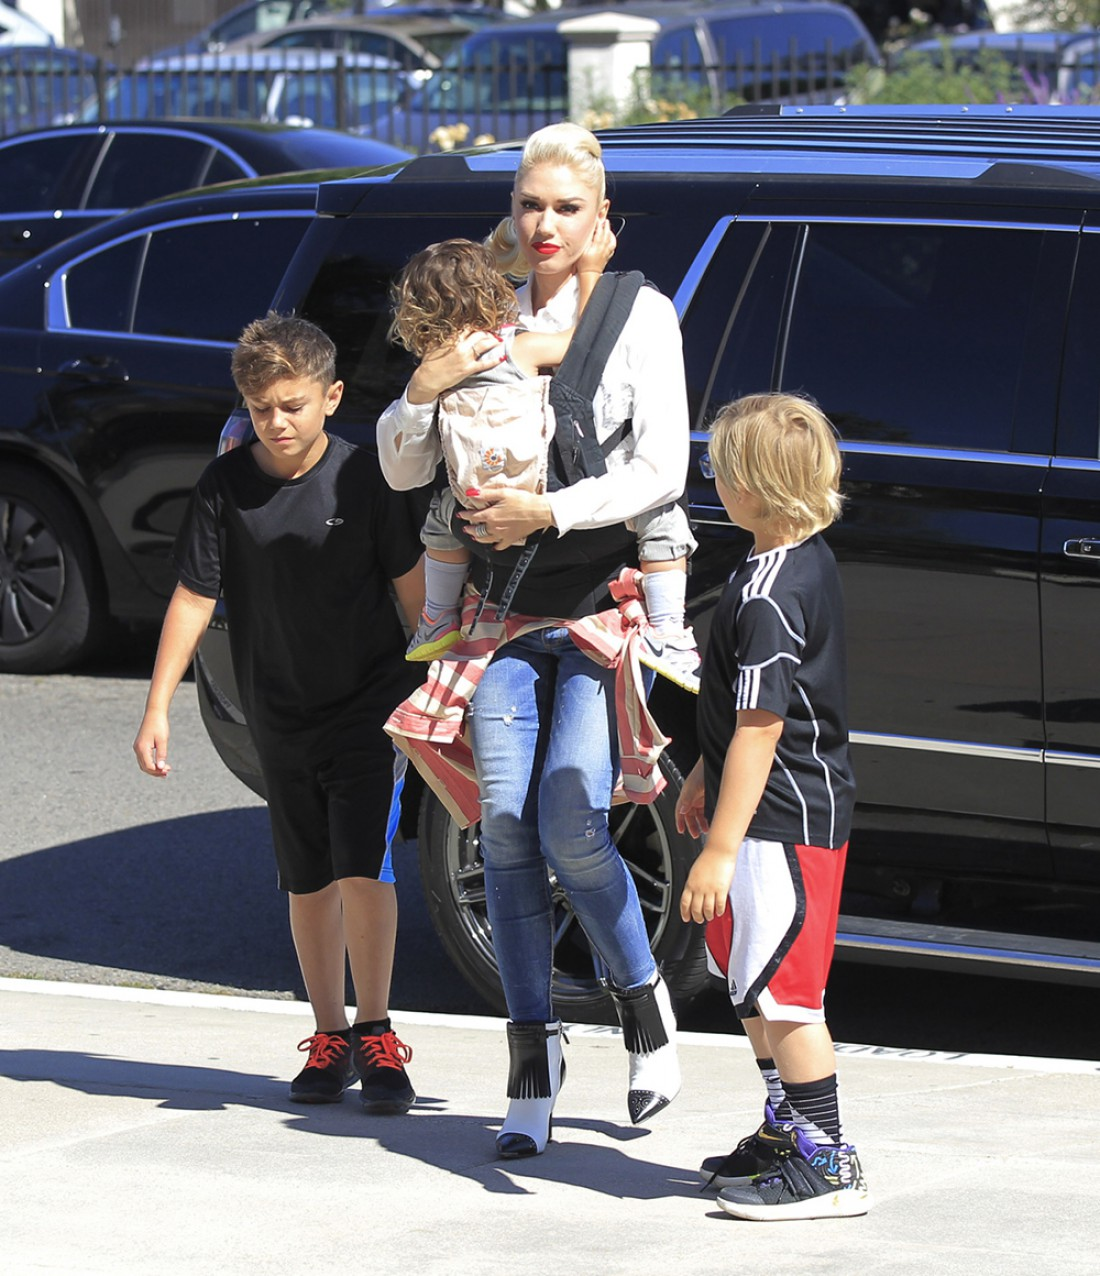 Певица Гвен Стефани с детьми